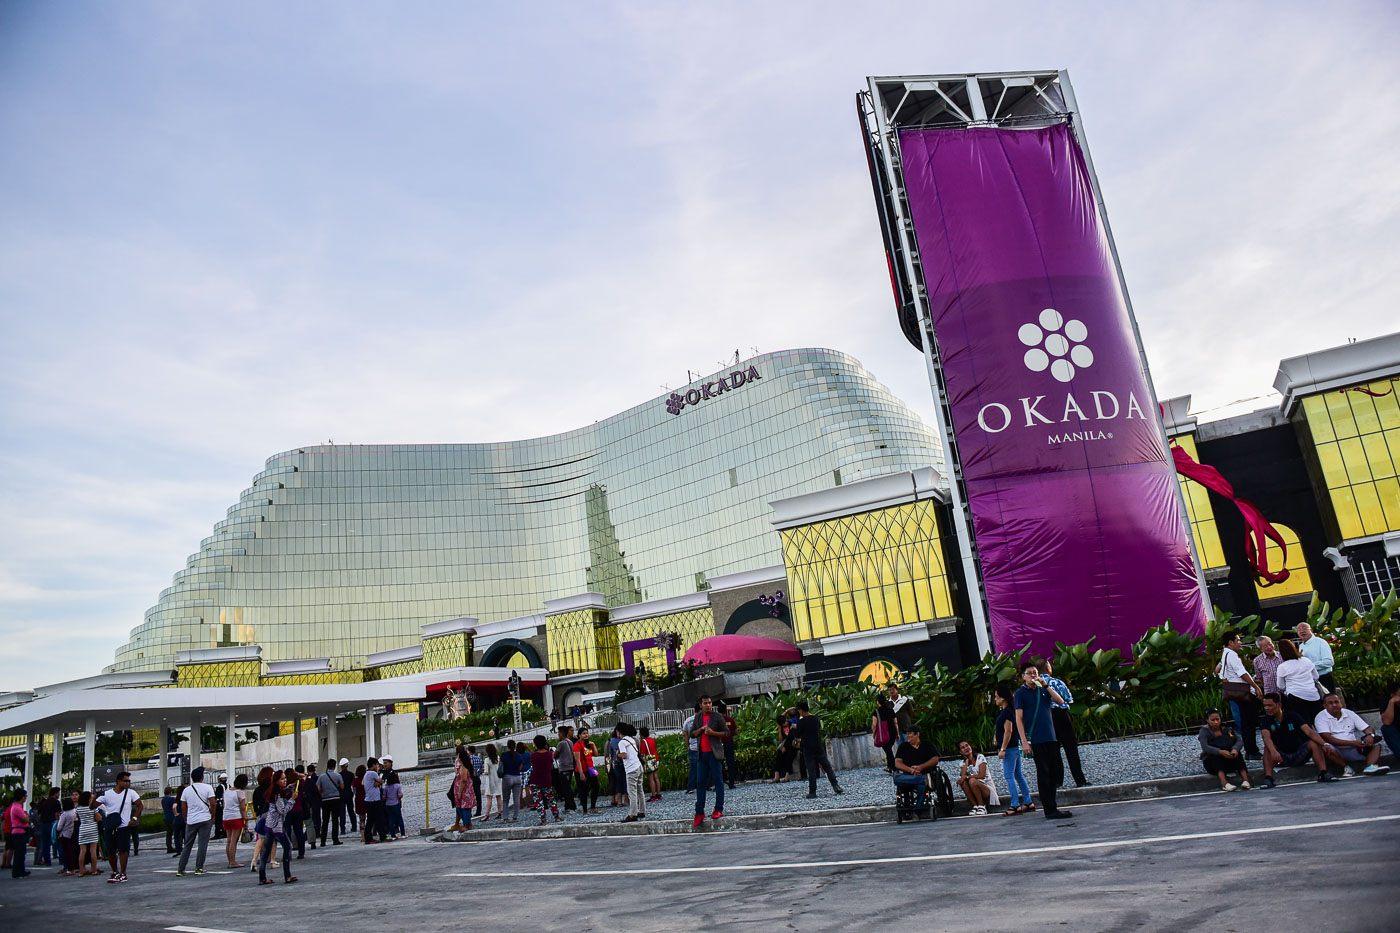 Okada Manila casino resort Philippines